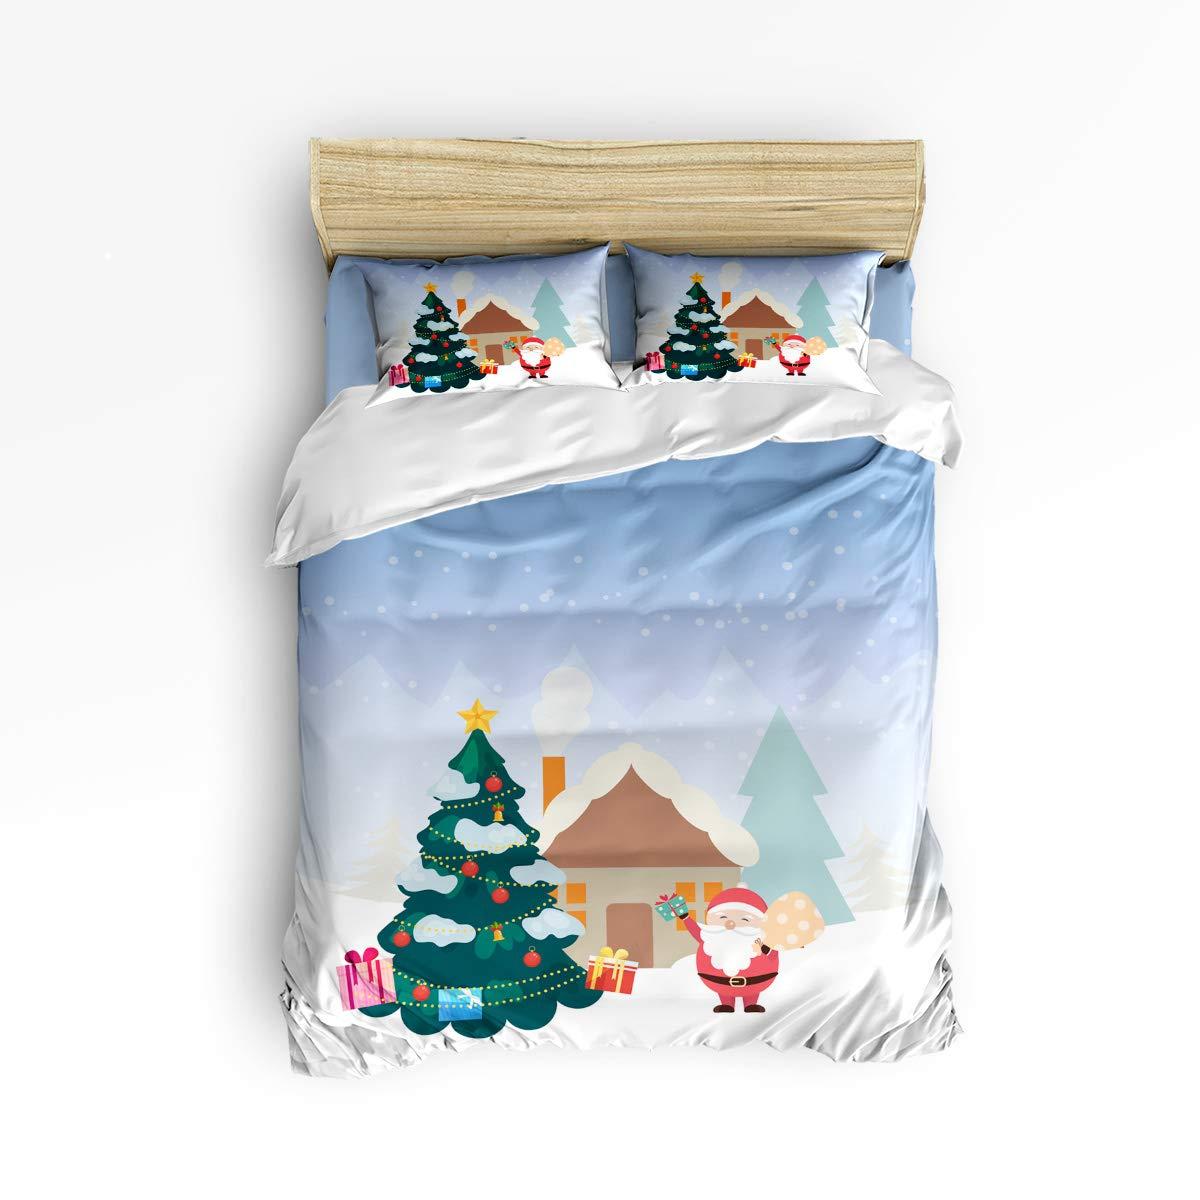 Valenake 高級掛け布団カバー4点セット メリークリスマステーマ寝具セット 隠しファスナー付き 超ソフト 耐久性 耐退色性 掛け布団なし クイーン VA20181130LTTSJTDCSSWTQ01570SJTCVAE B07KZW6B1X Santa Claus Christmas Treevae1790 クイーン